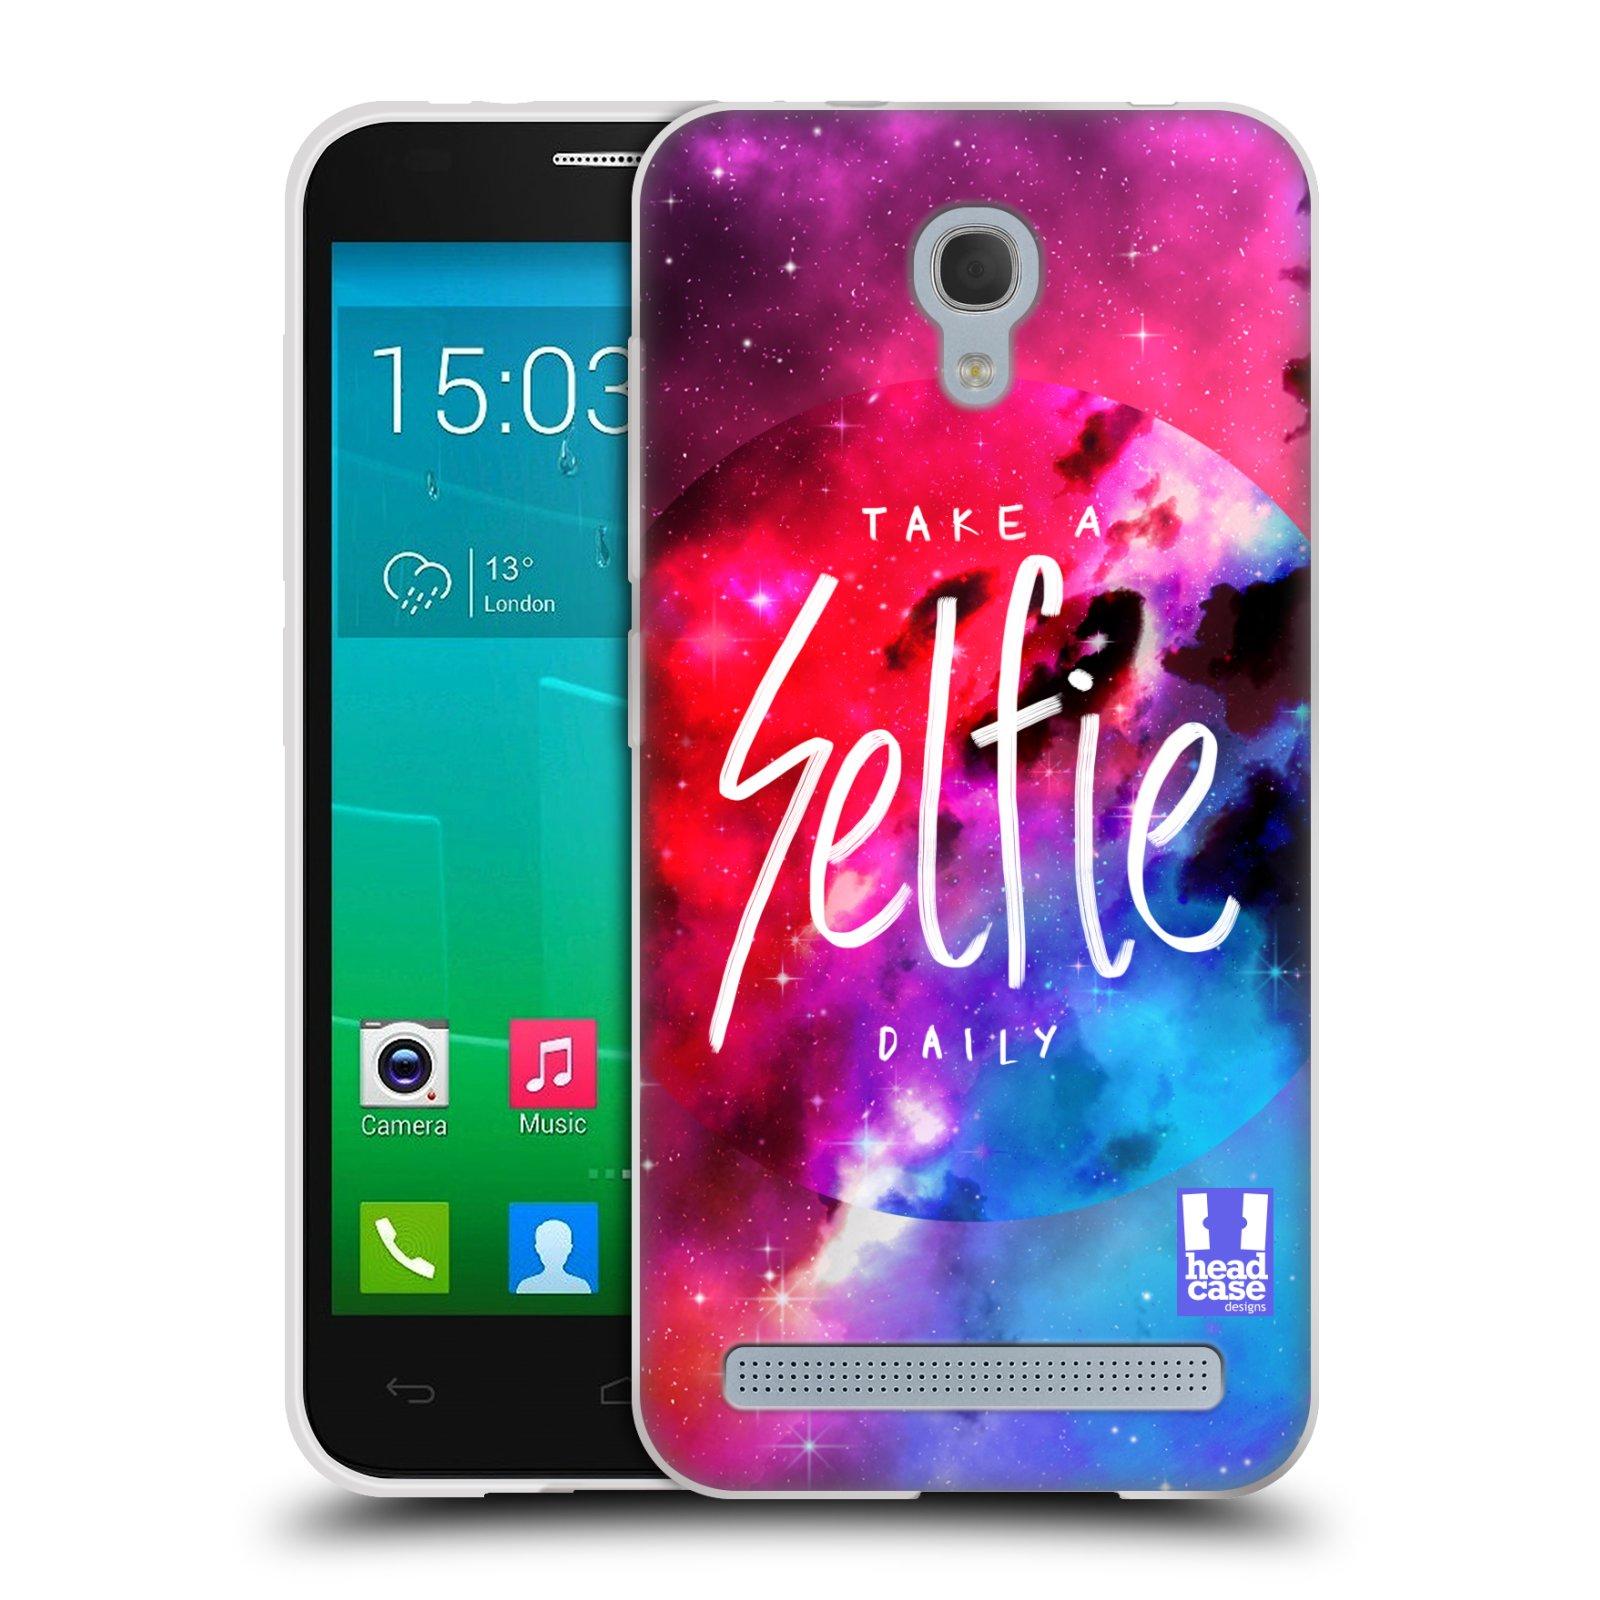 Silikonové pouzdro na mobil Alcatel One Touch Idol 2 Mini S 6036Y HEAD CASE SELFIE DAILY